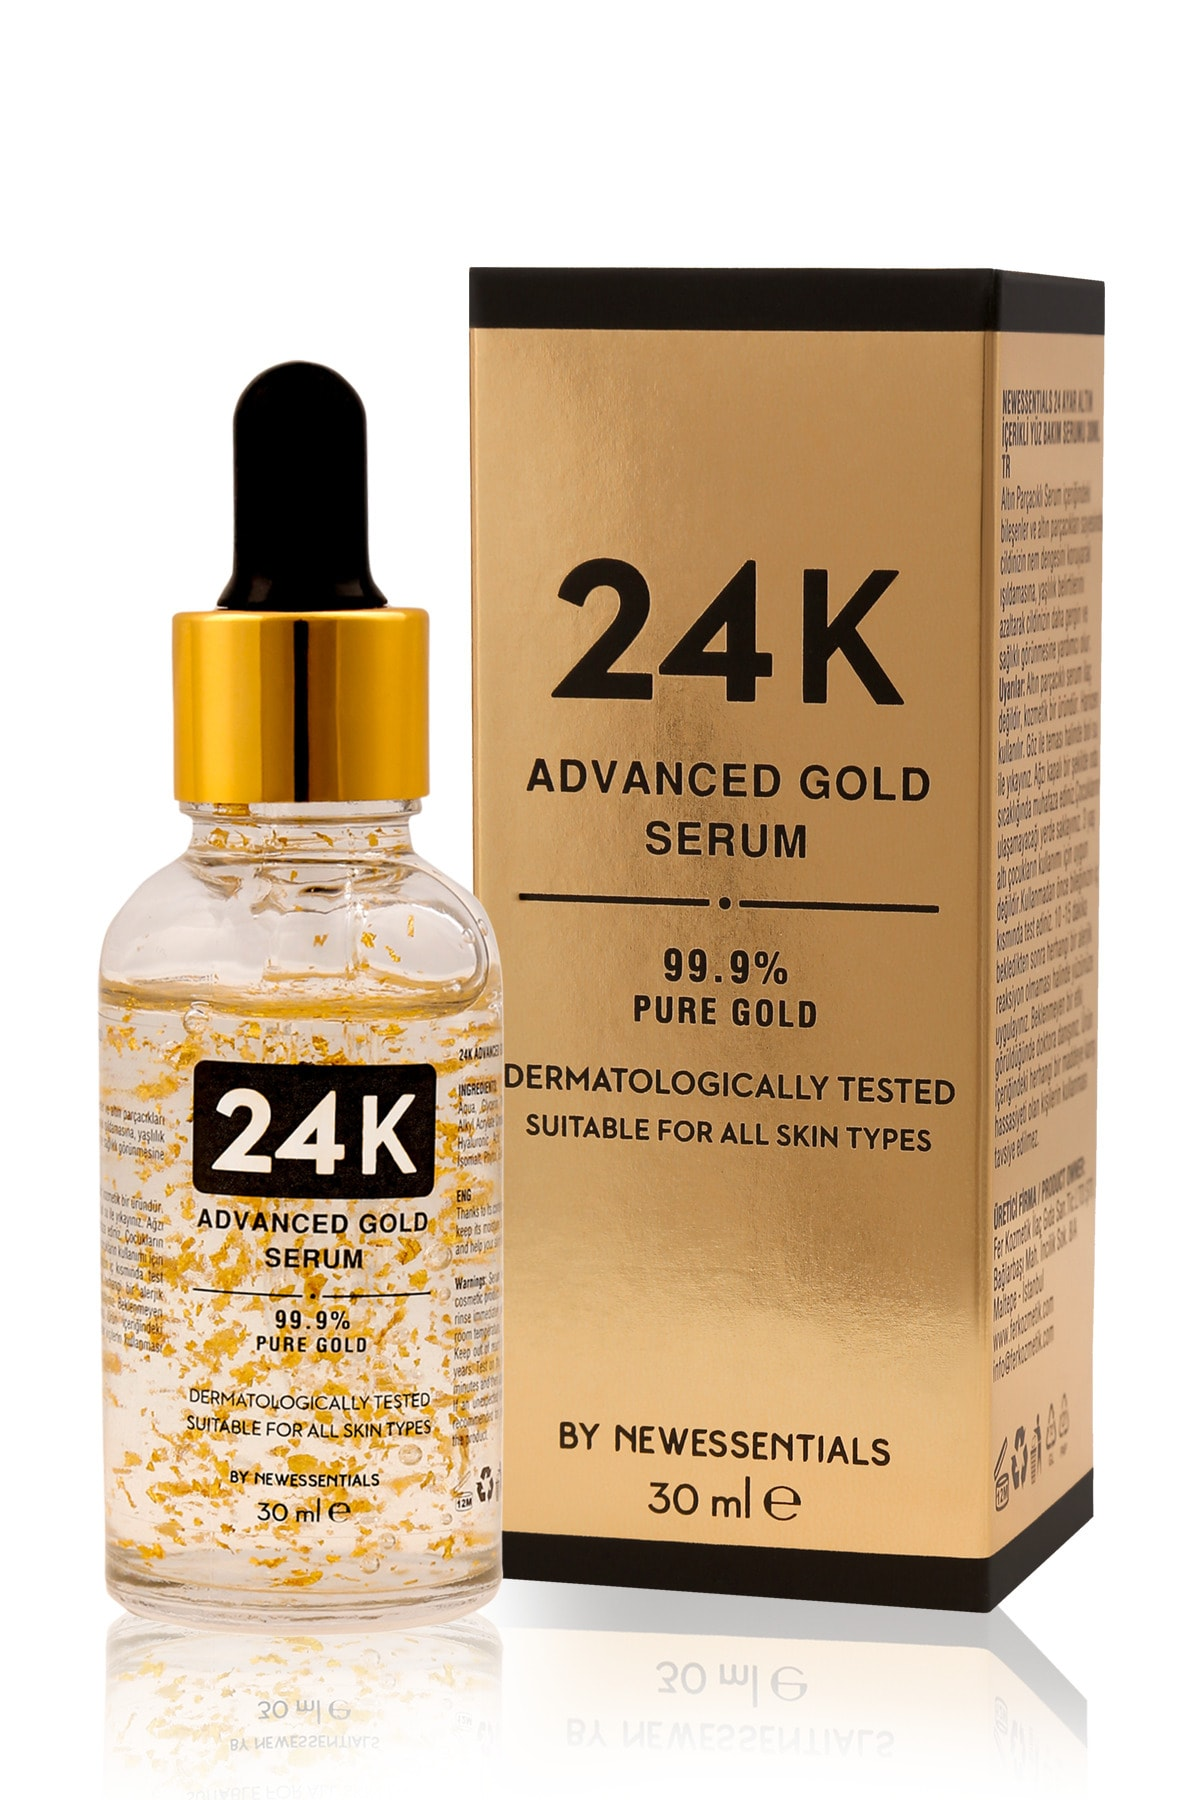 New Essentials 24k Advanced Gold Serum 30 Ml 1